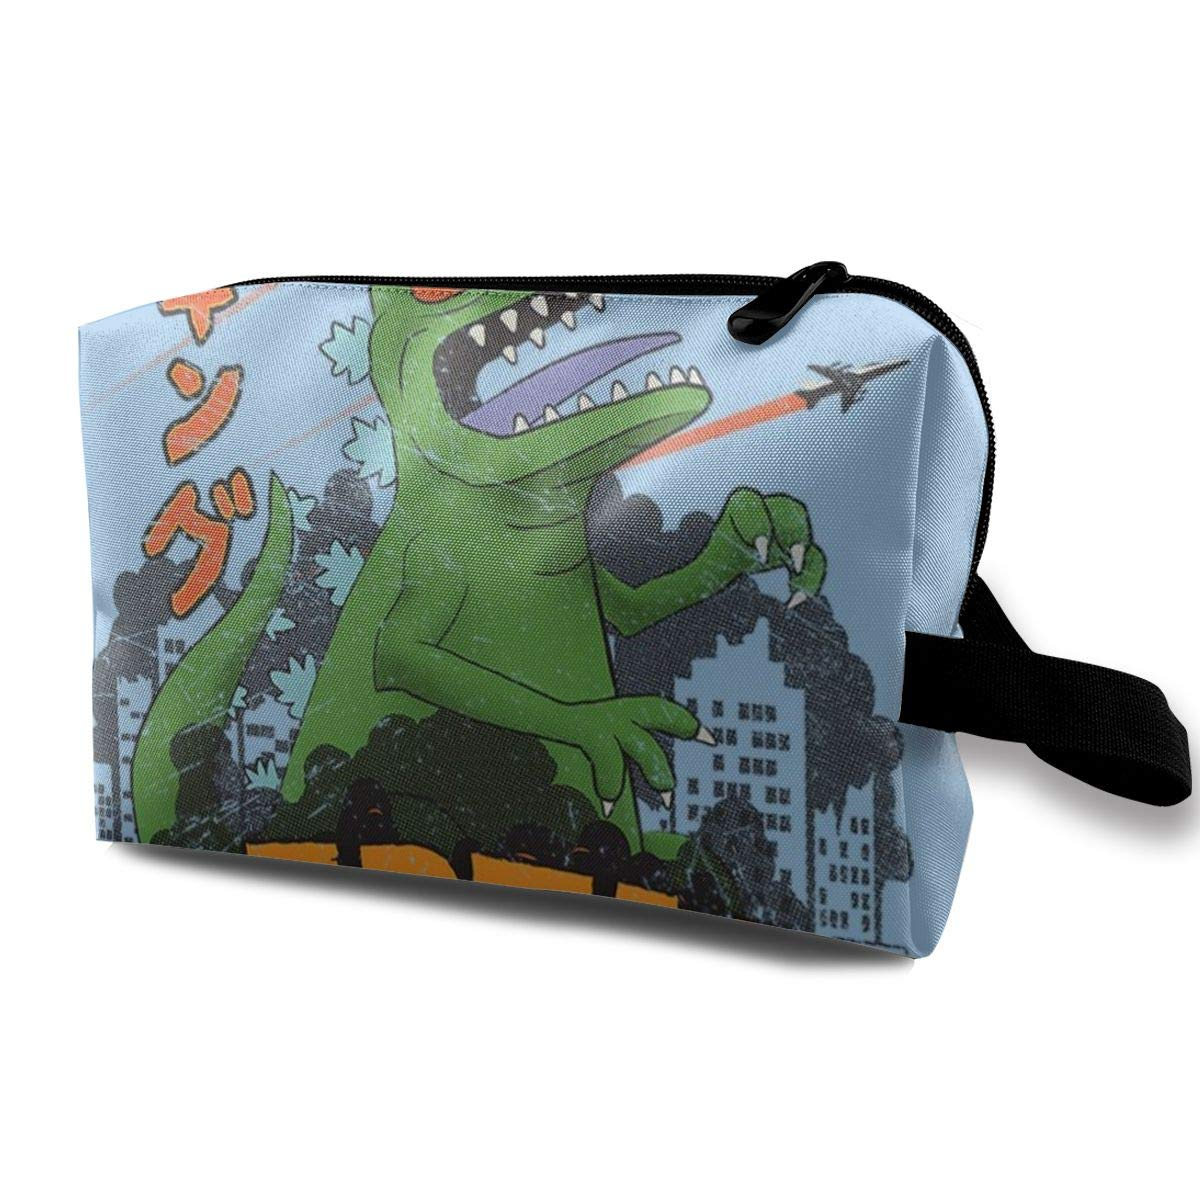 Makeup Bag Cosmetic Pouch Rugrats Reptar Godzilla Mix Multi-Functional Bag Travel Kit Storage Bag